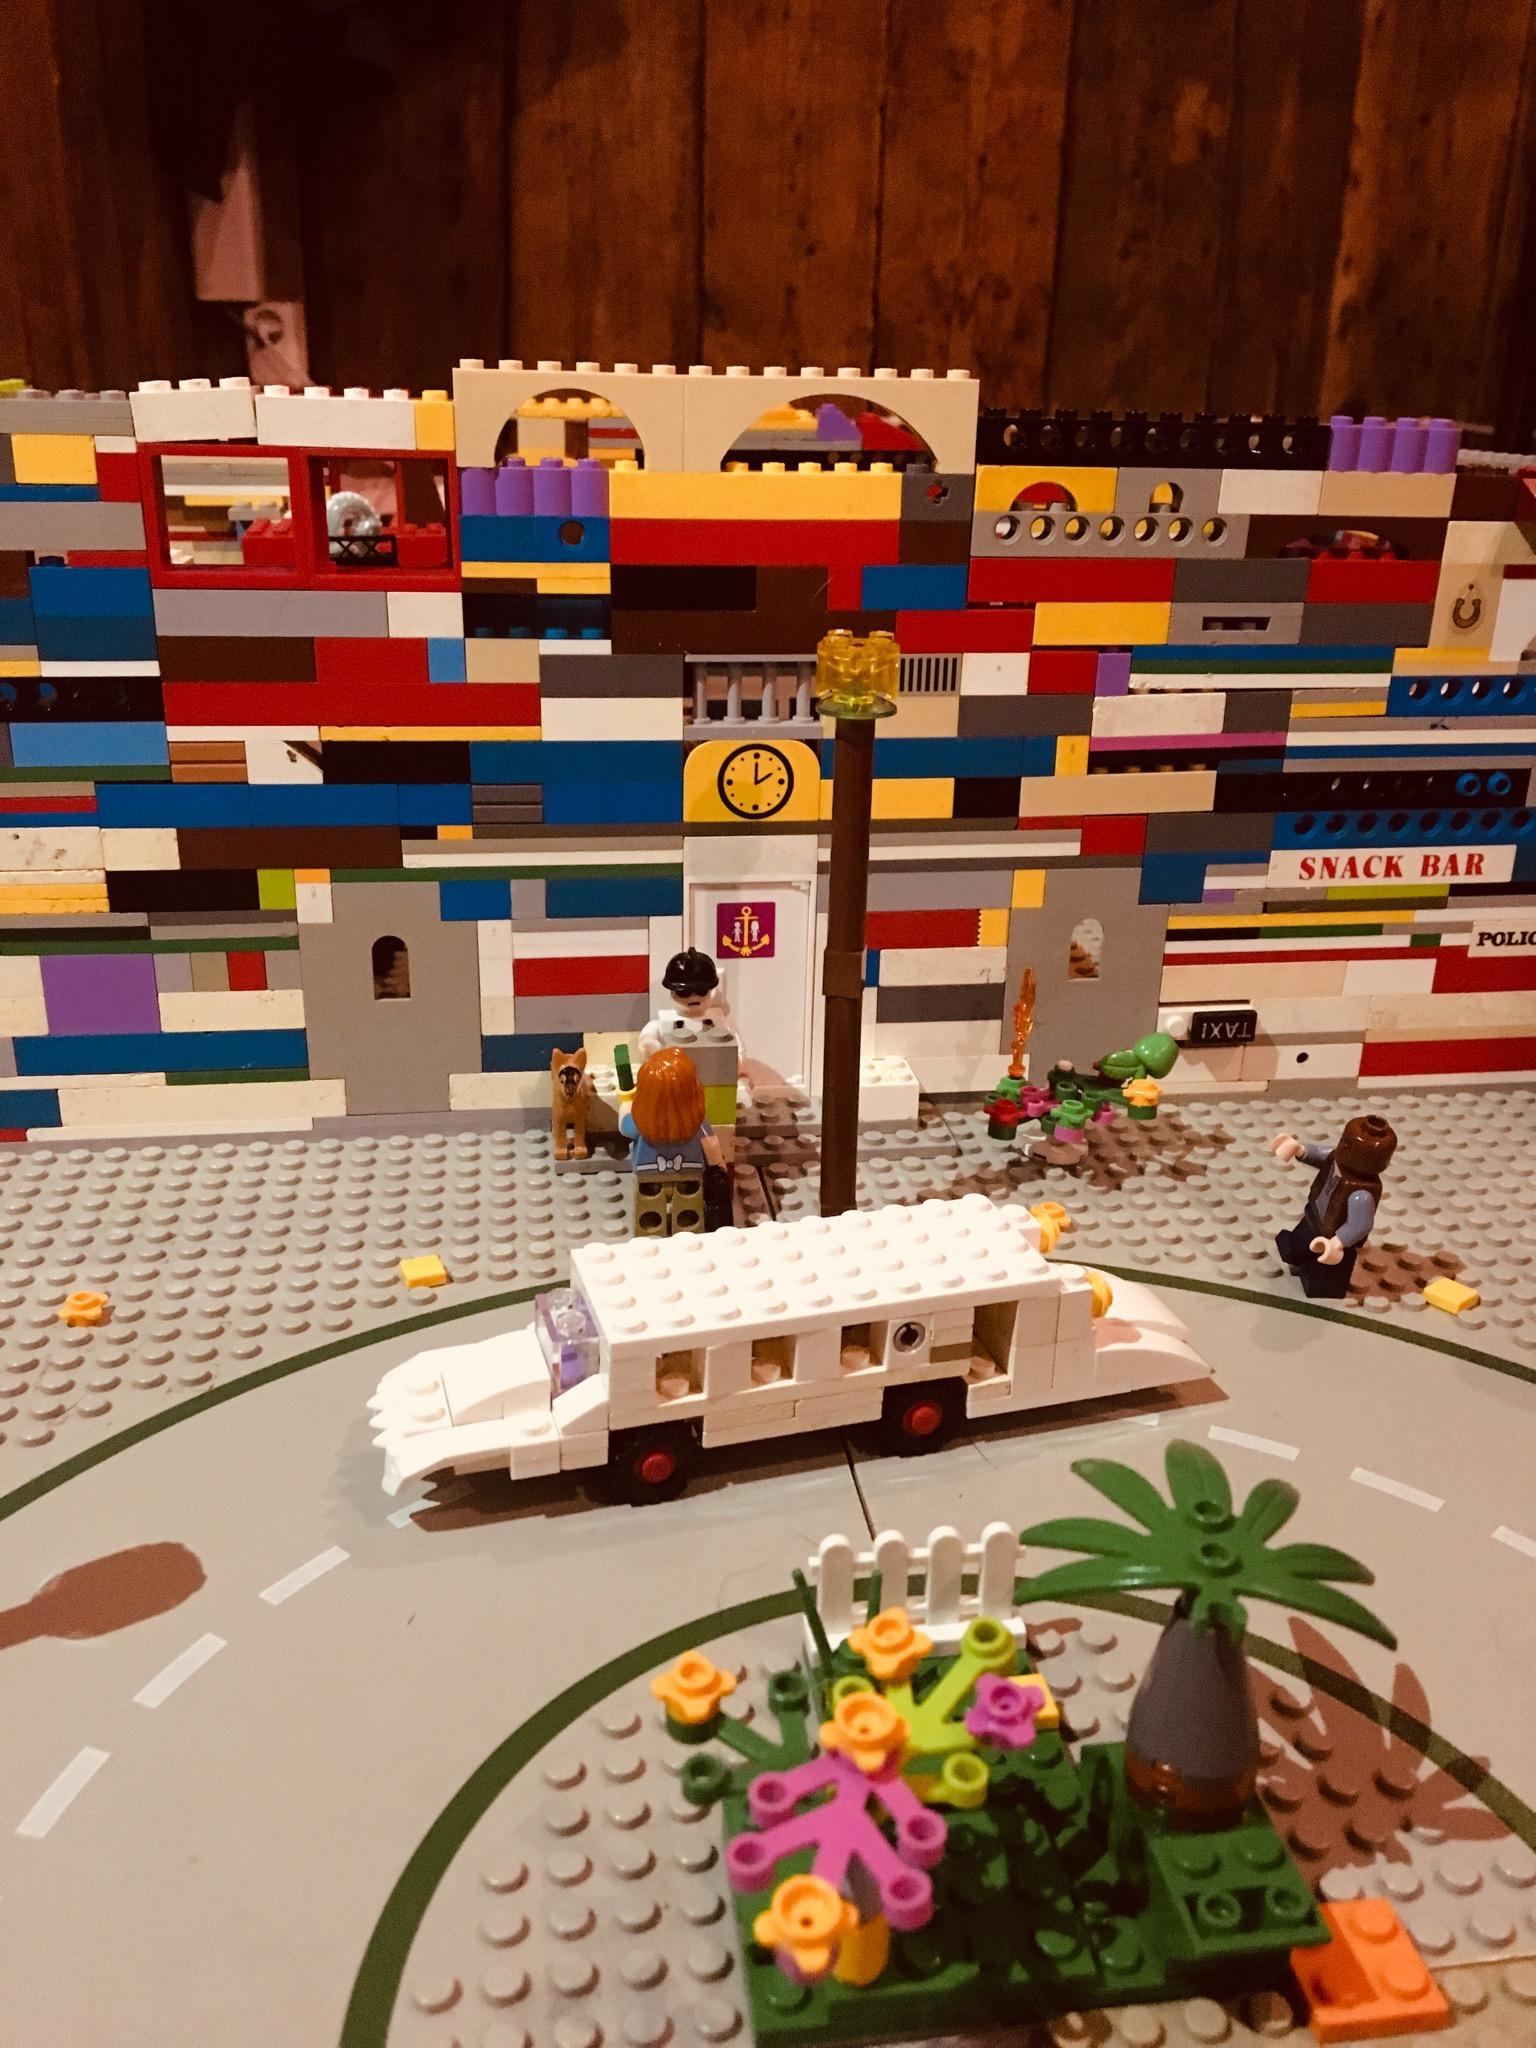 Lego limousine, limousine, Lego hotel